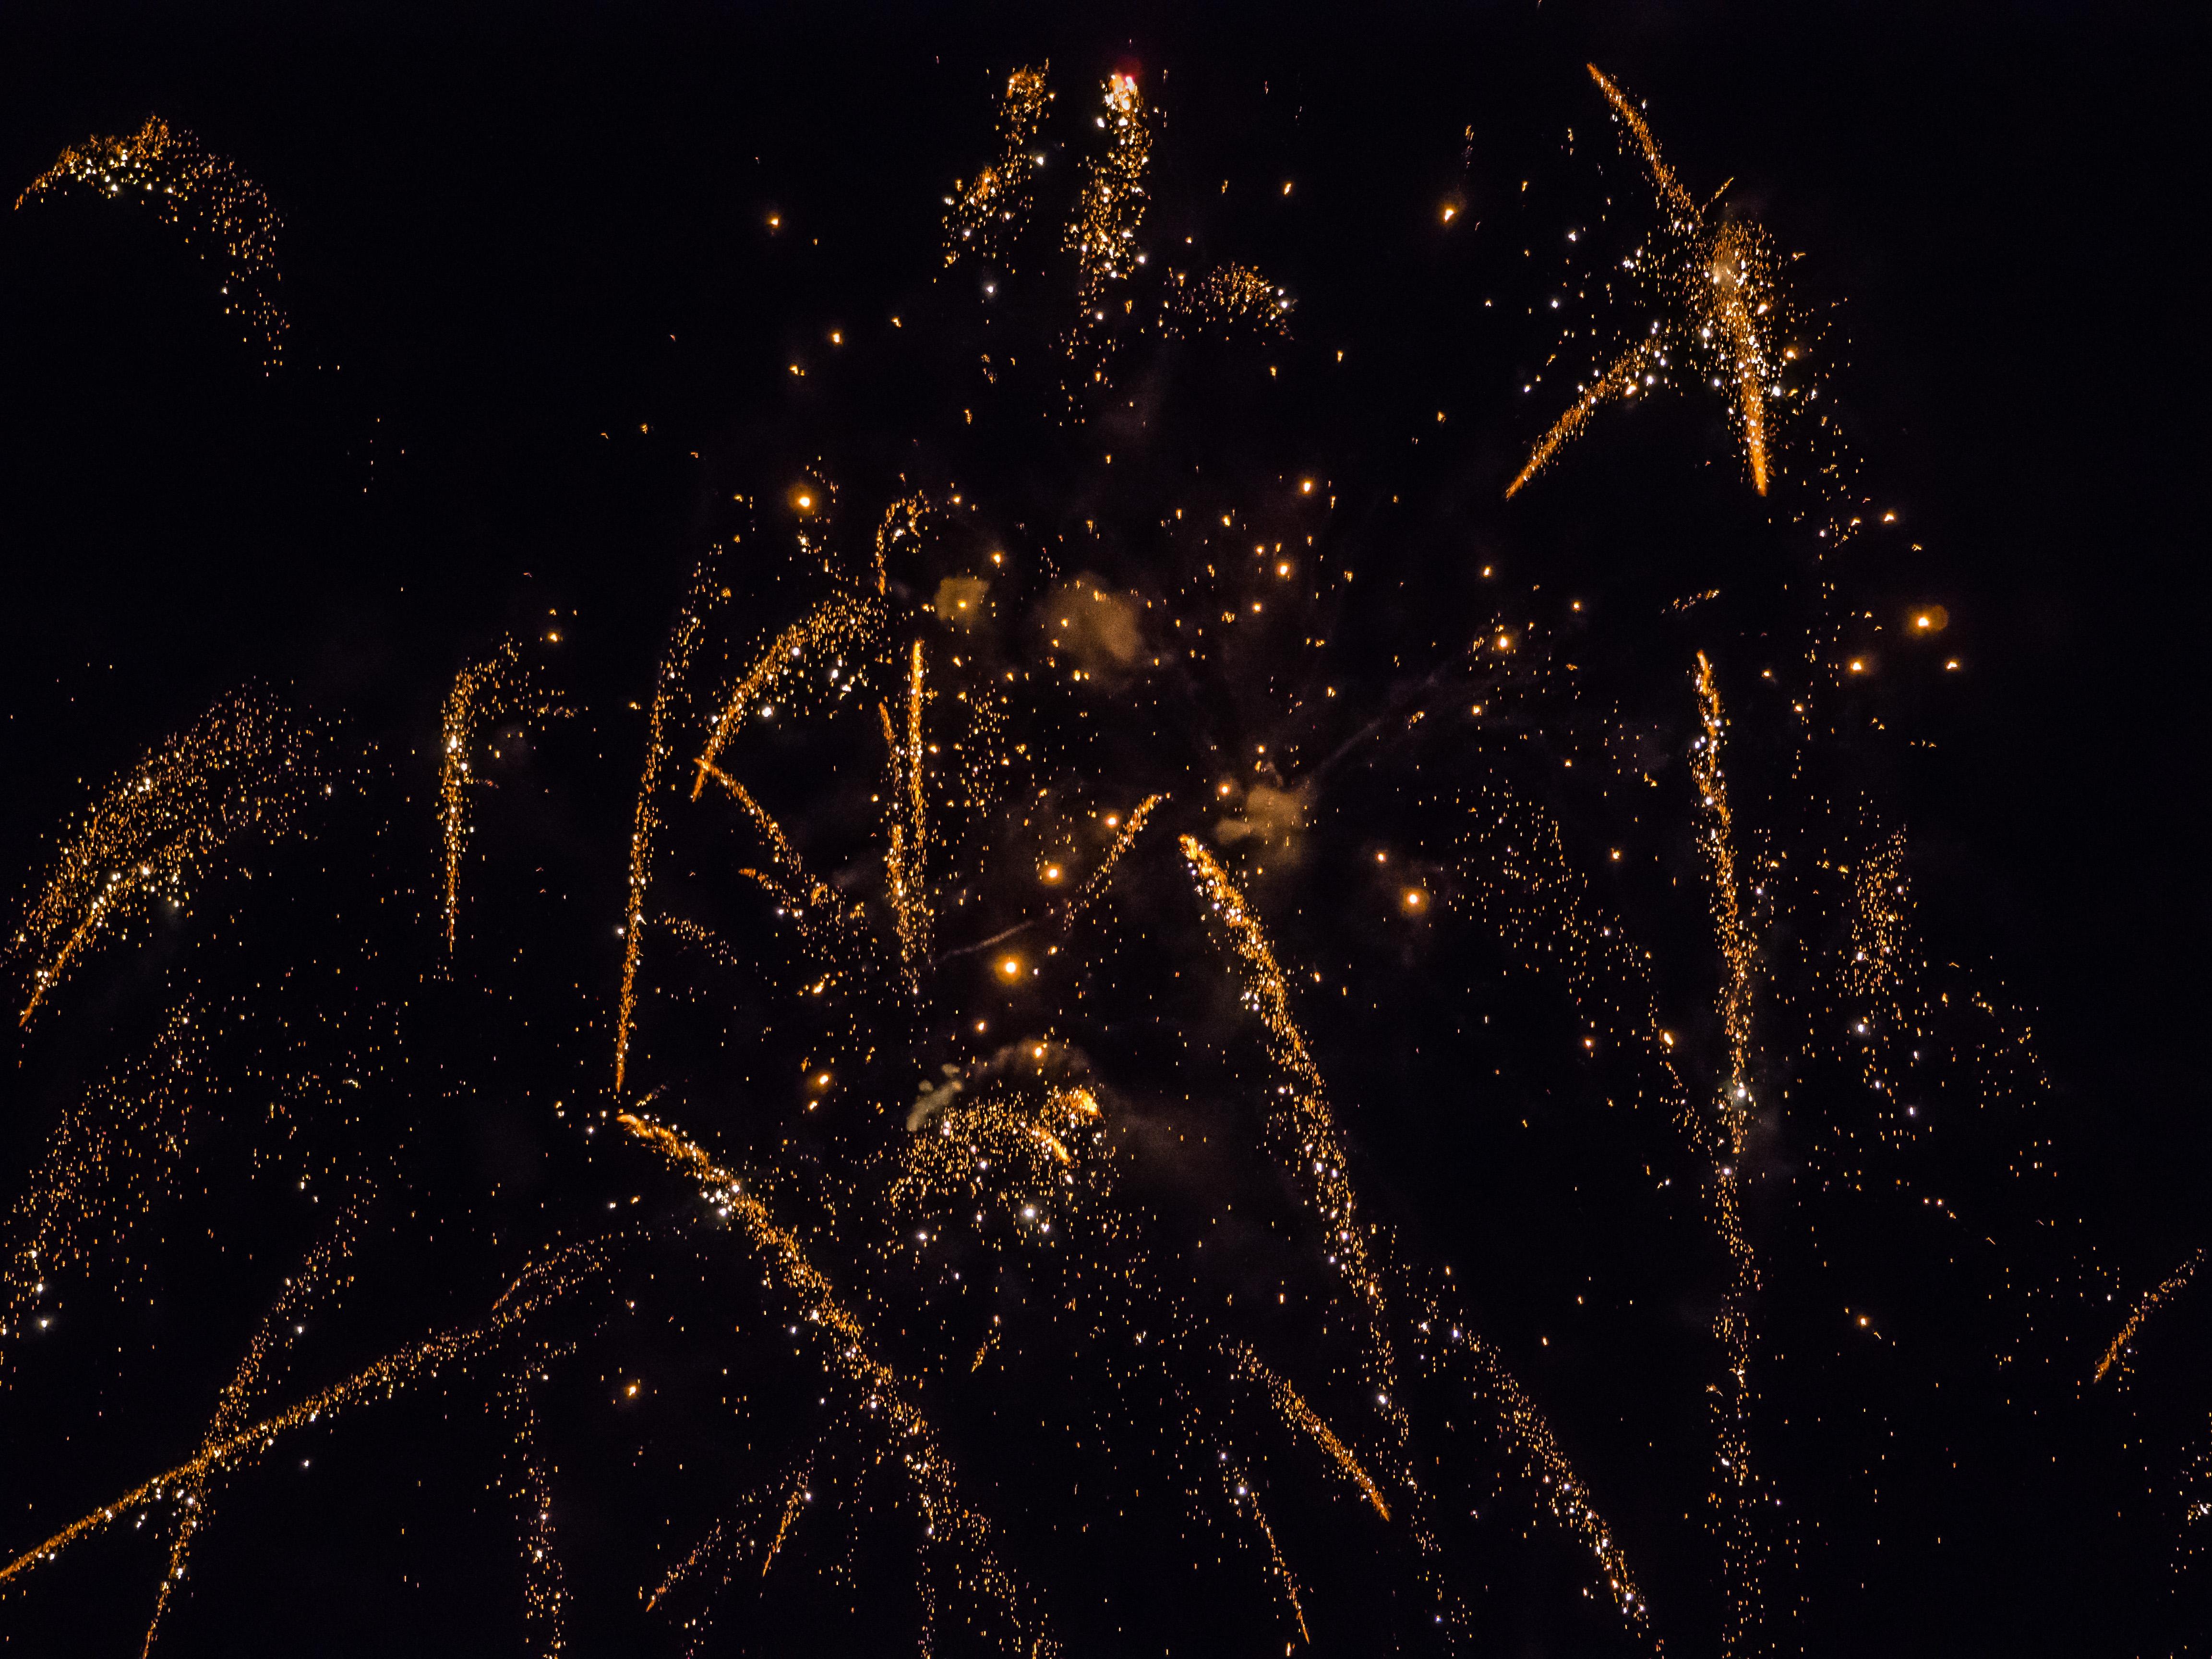 St cyprien pre bastille day fireworks at garrit-france-em10-20150713-p7130338.jpg photo